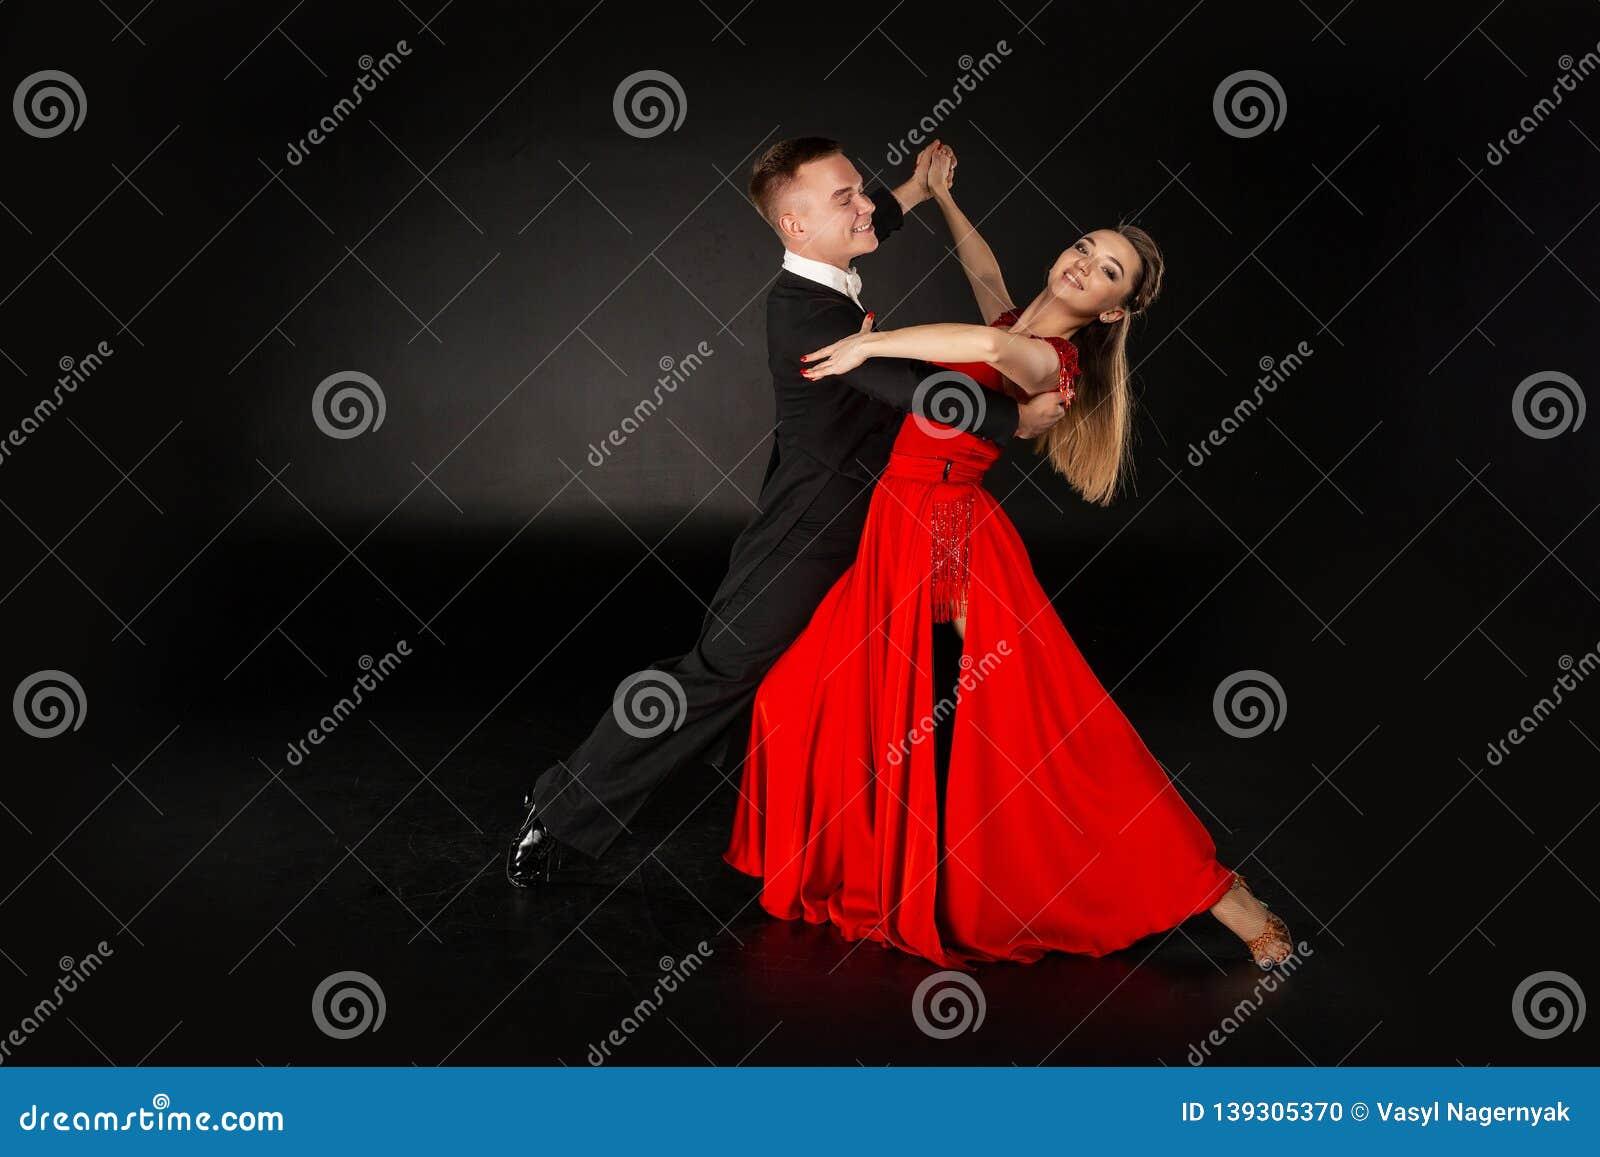 86f9b3e073d1b Sensual professional dancers dancing tango. Girl in red dress and men in  black suit. Studio shot on black background